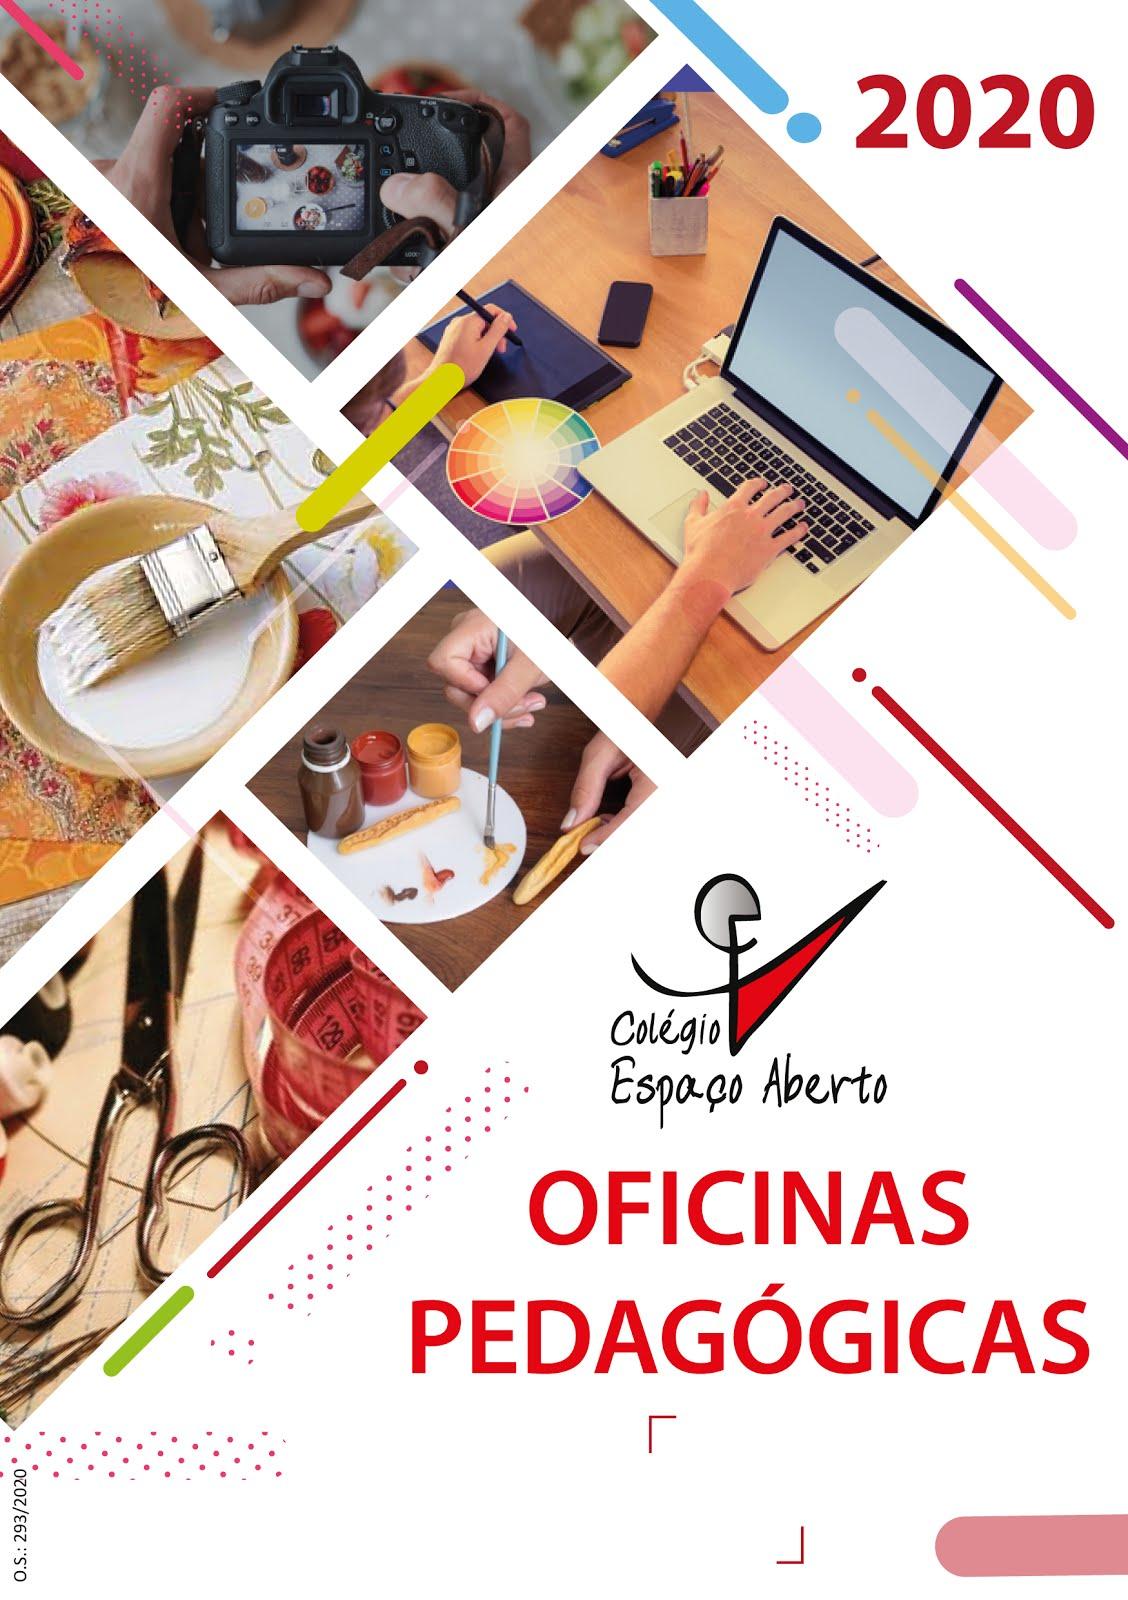 Oficinas Pedagógicas 2020